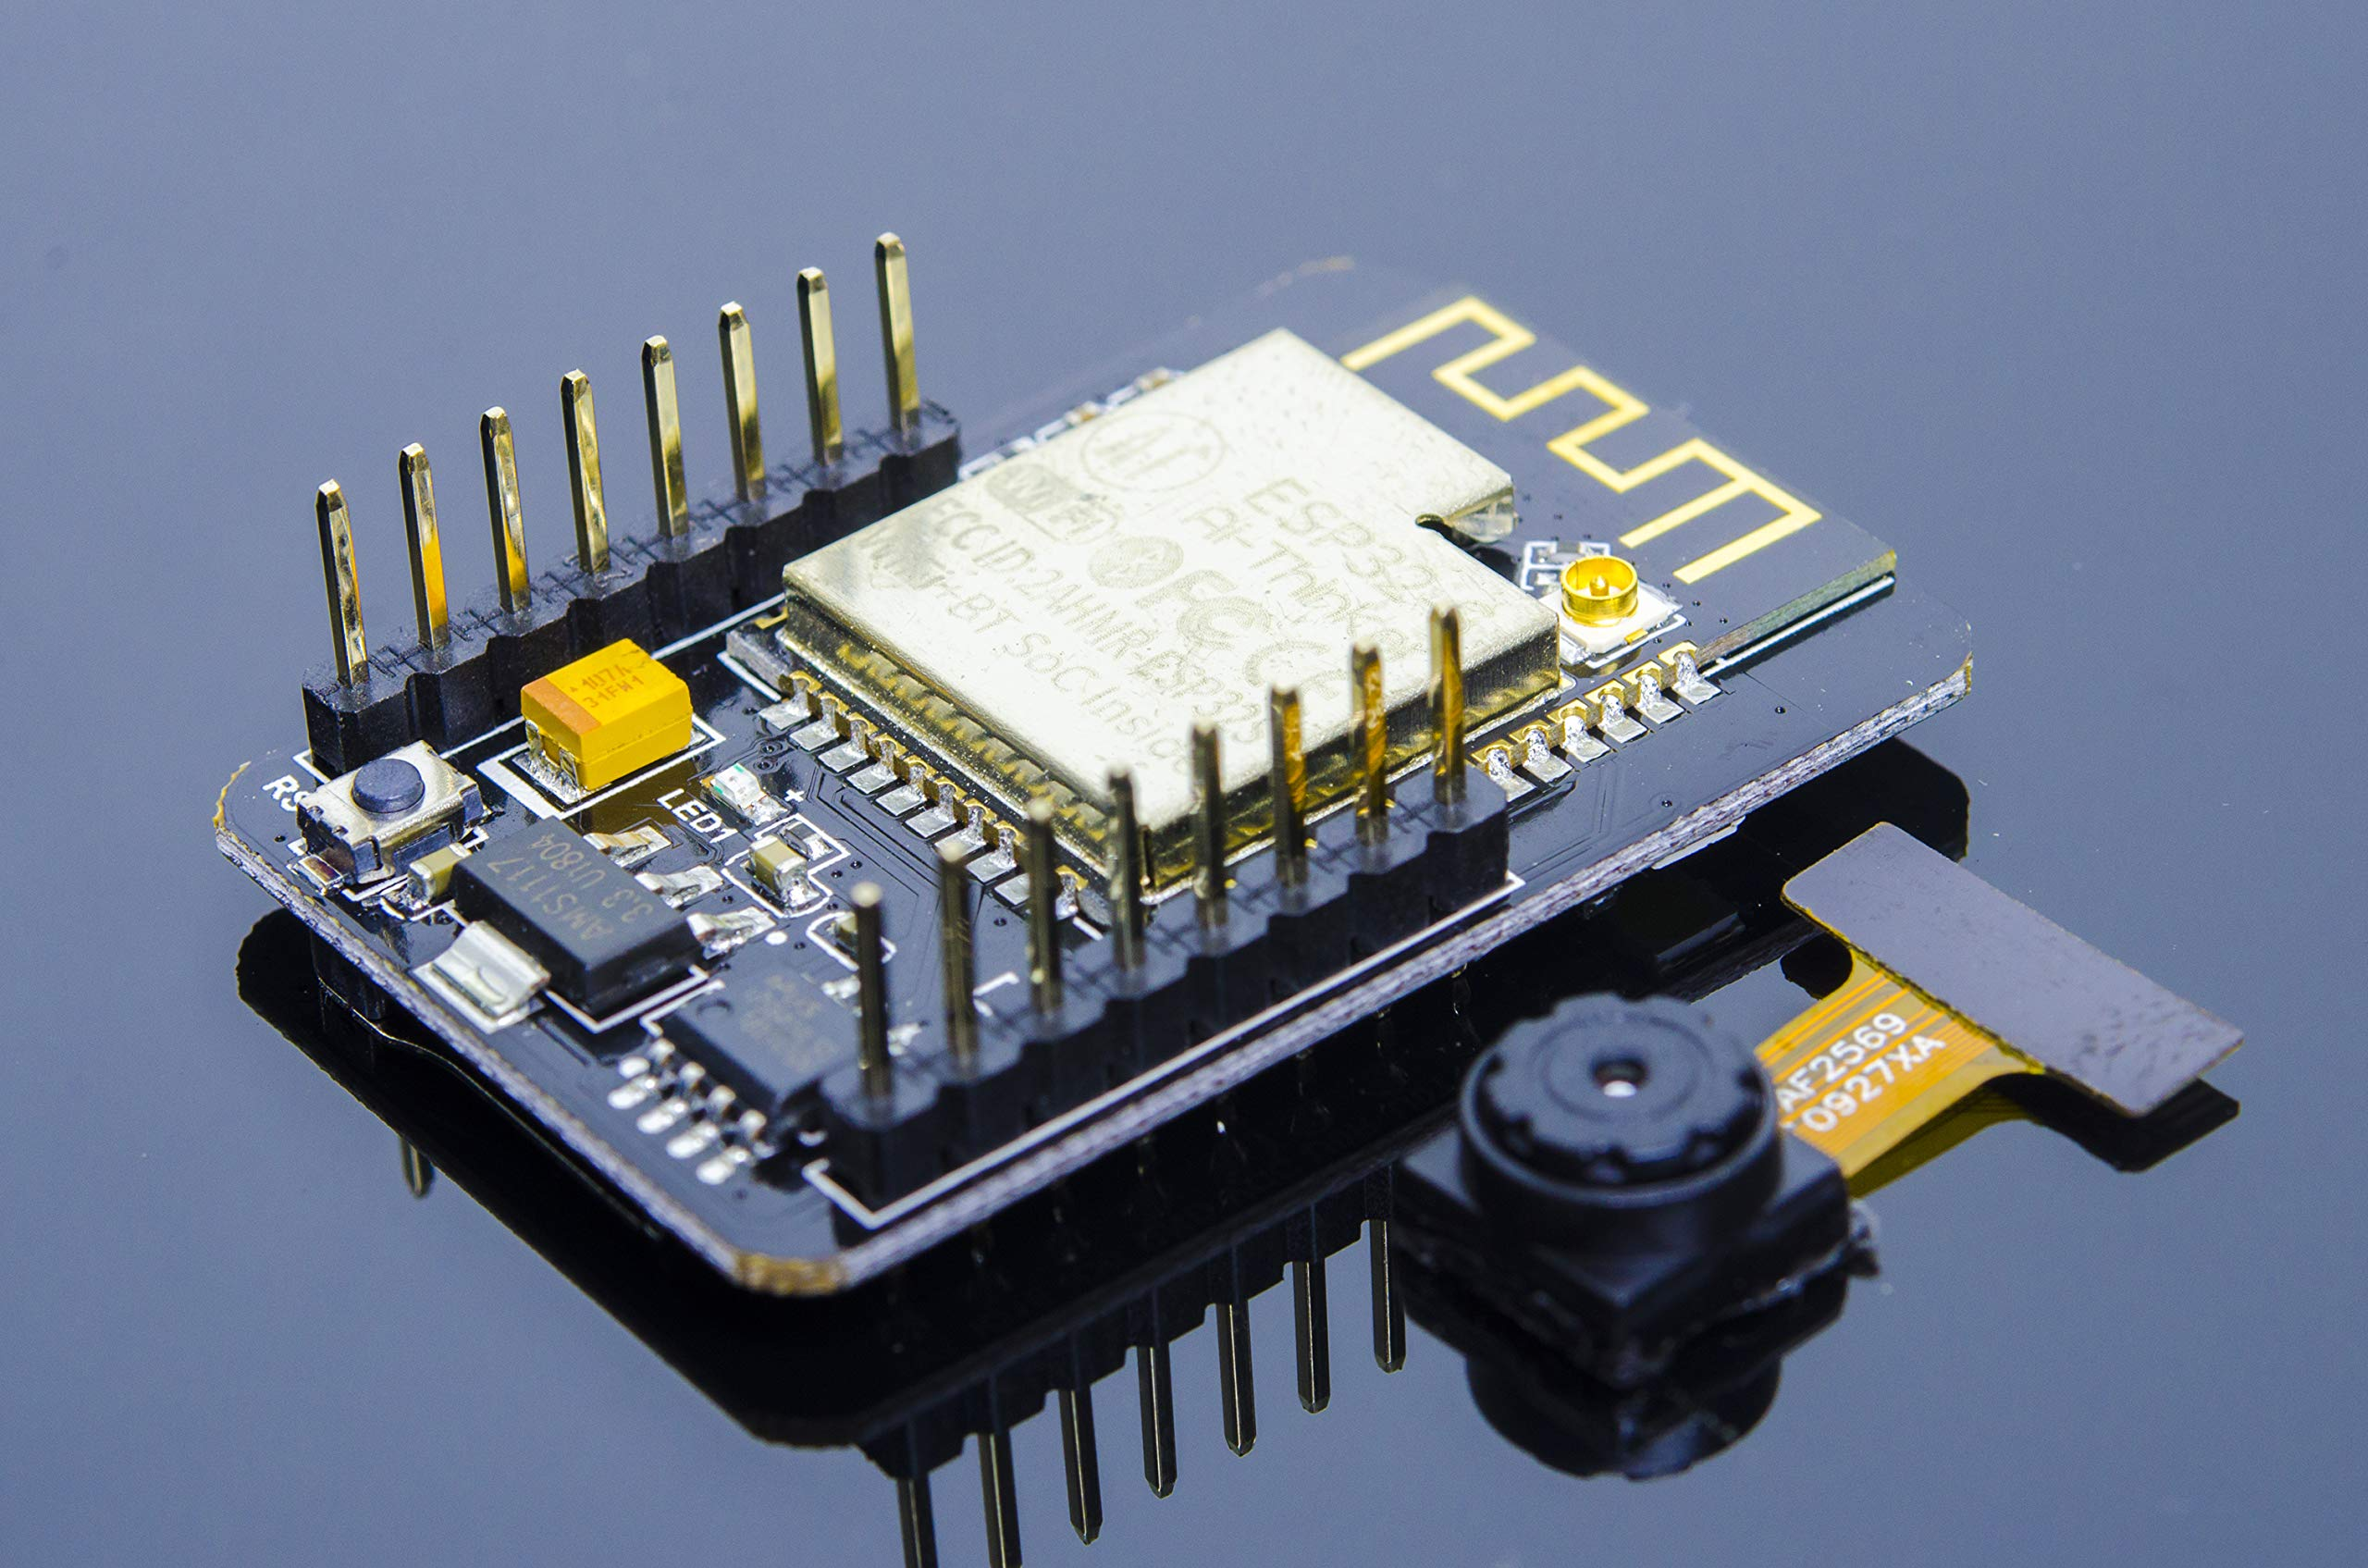 Placa De Desarrollo Acrobotic Esp32-cam Con Modulo De Camara Ov2640 2mp Y Tarjeta Sd Para Arduino Esp8266 Raspberry Pi E